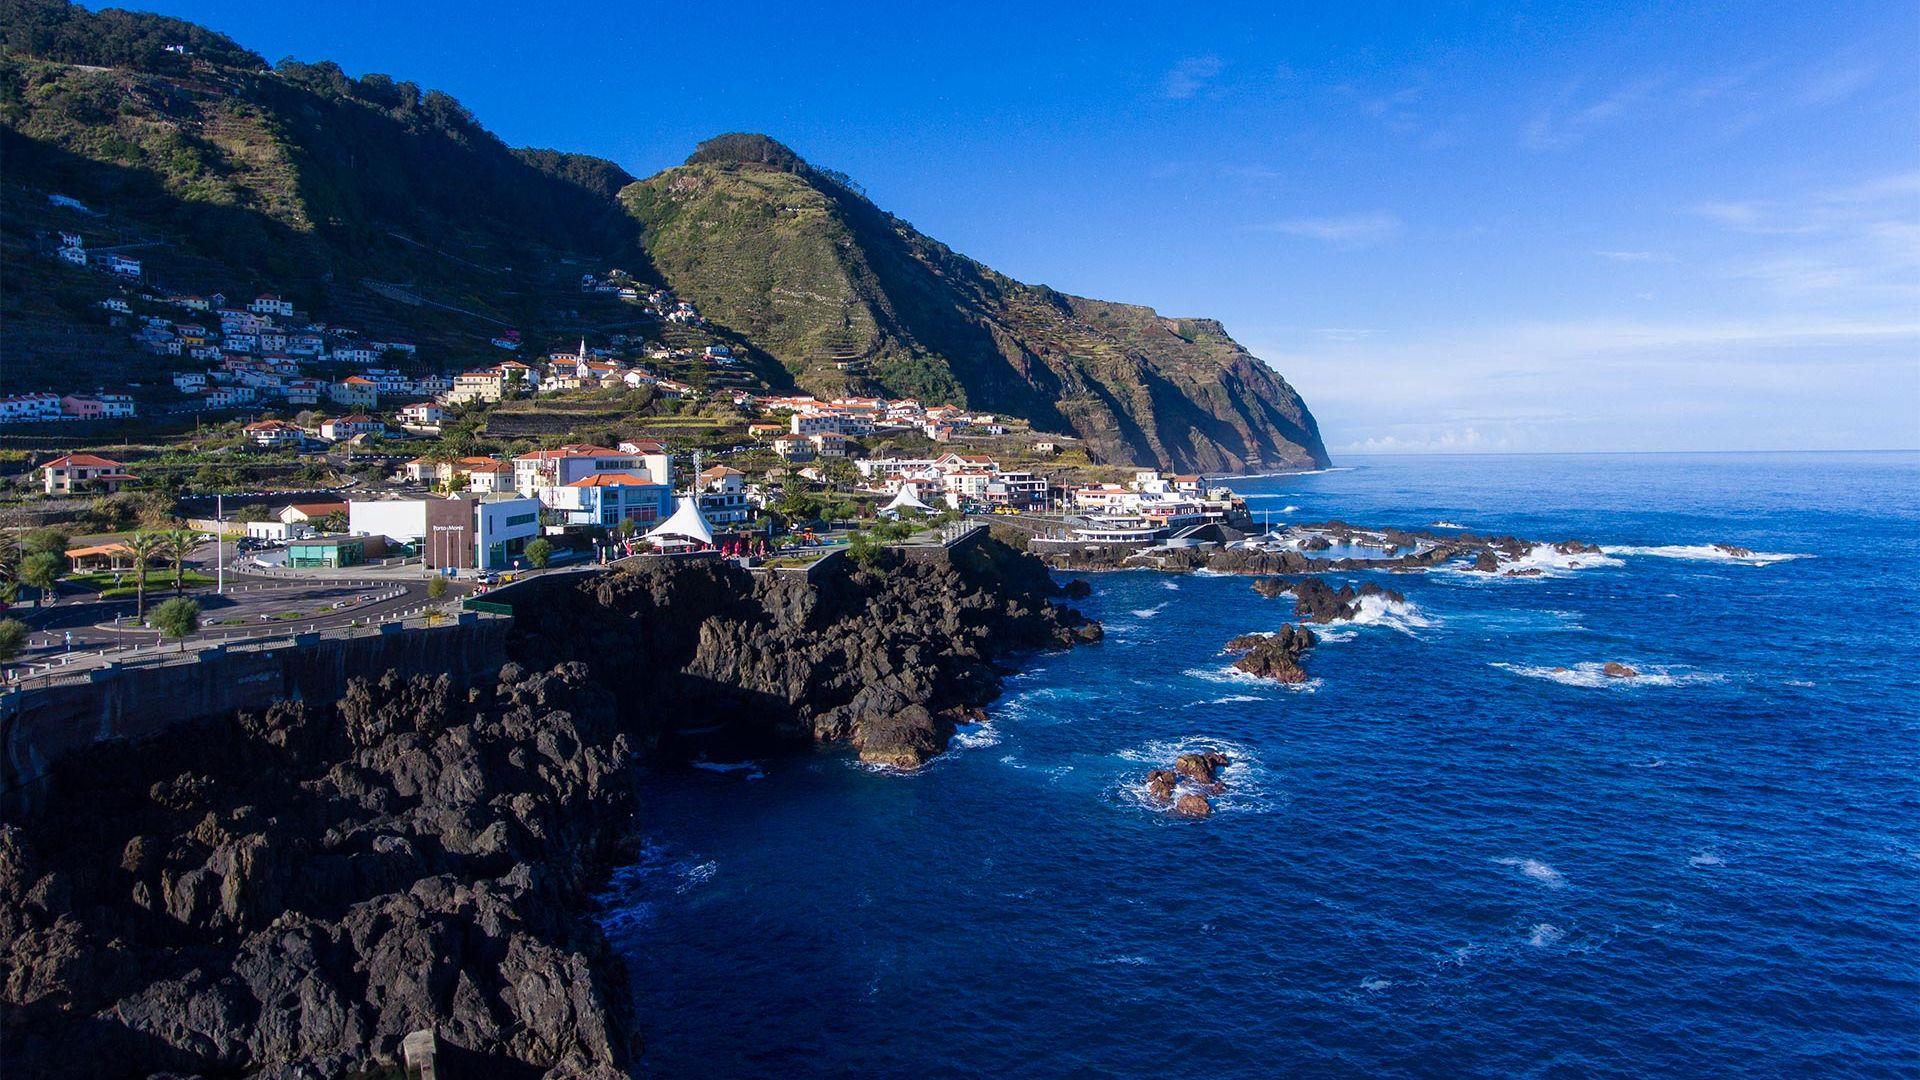 Sejur Charter Madeira, 8 zile - iulie 2021